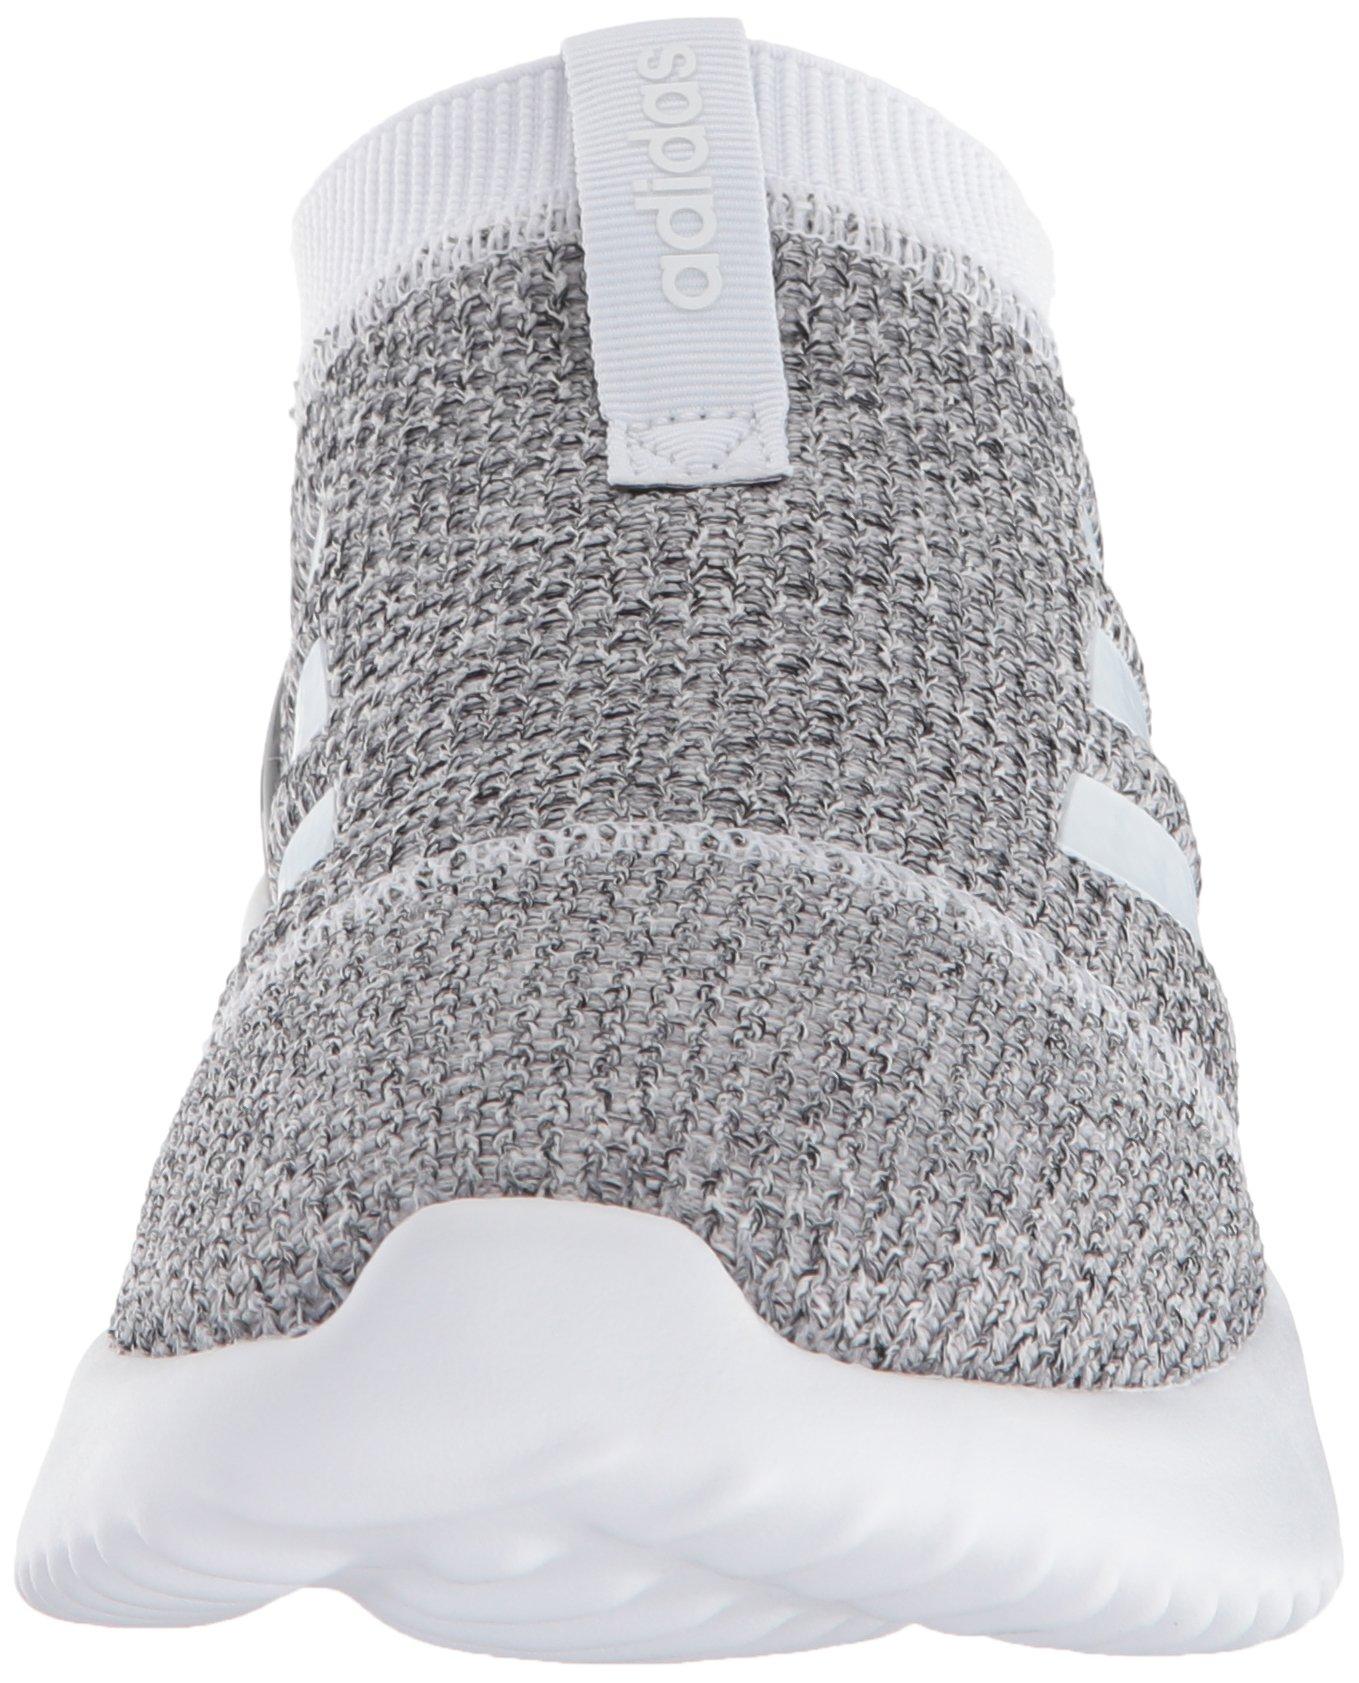 adidas Women's Ultimafusion Running Shoe, White/White/Black, 8 M US by adidas (Image #4)